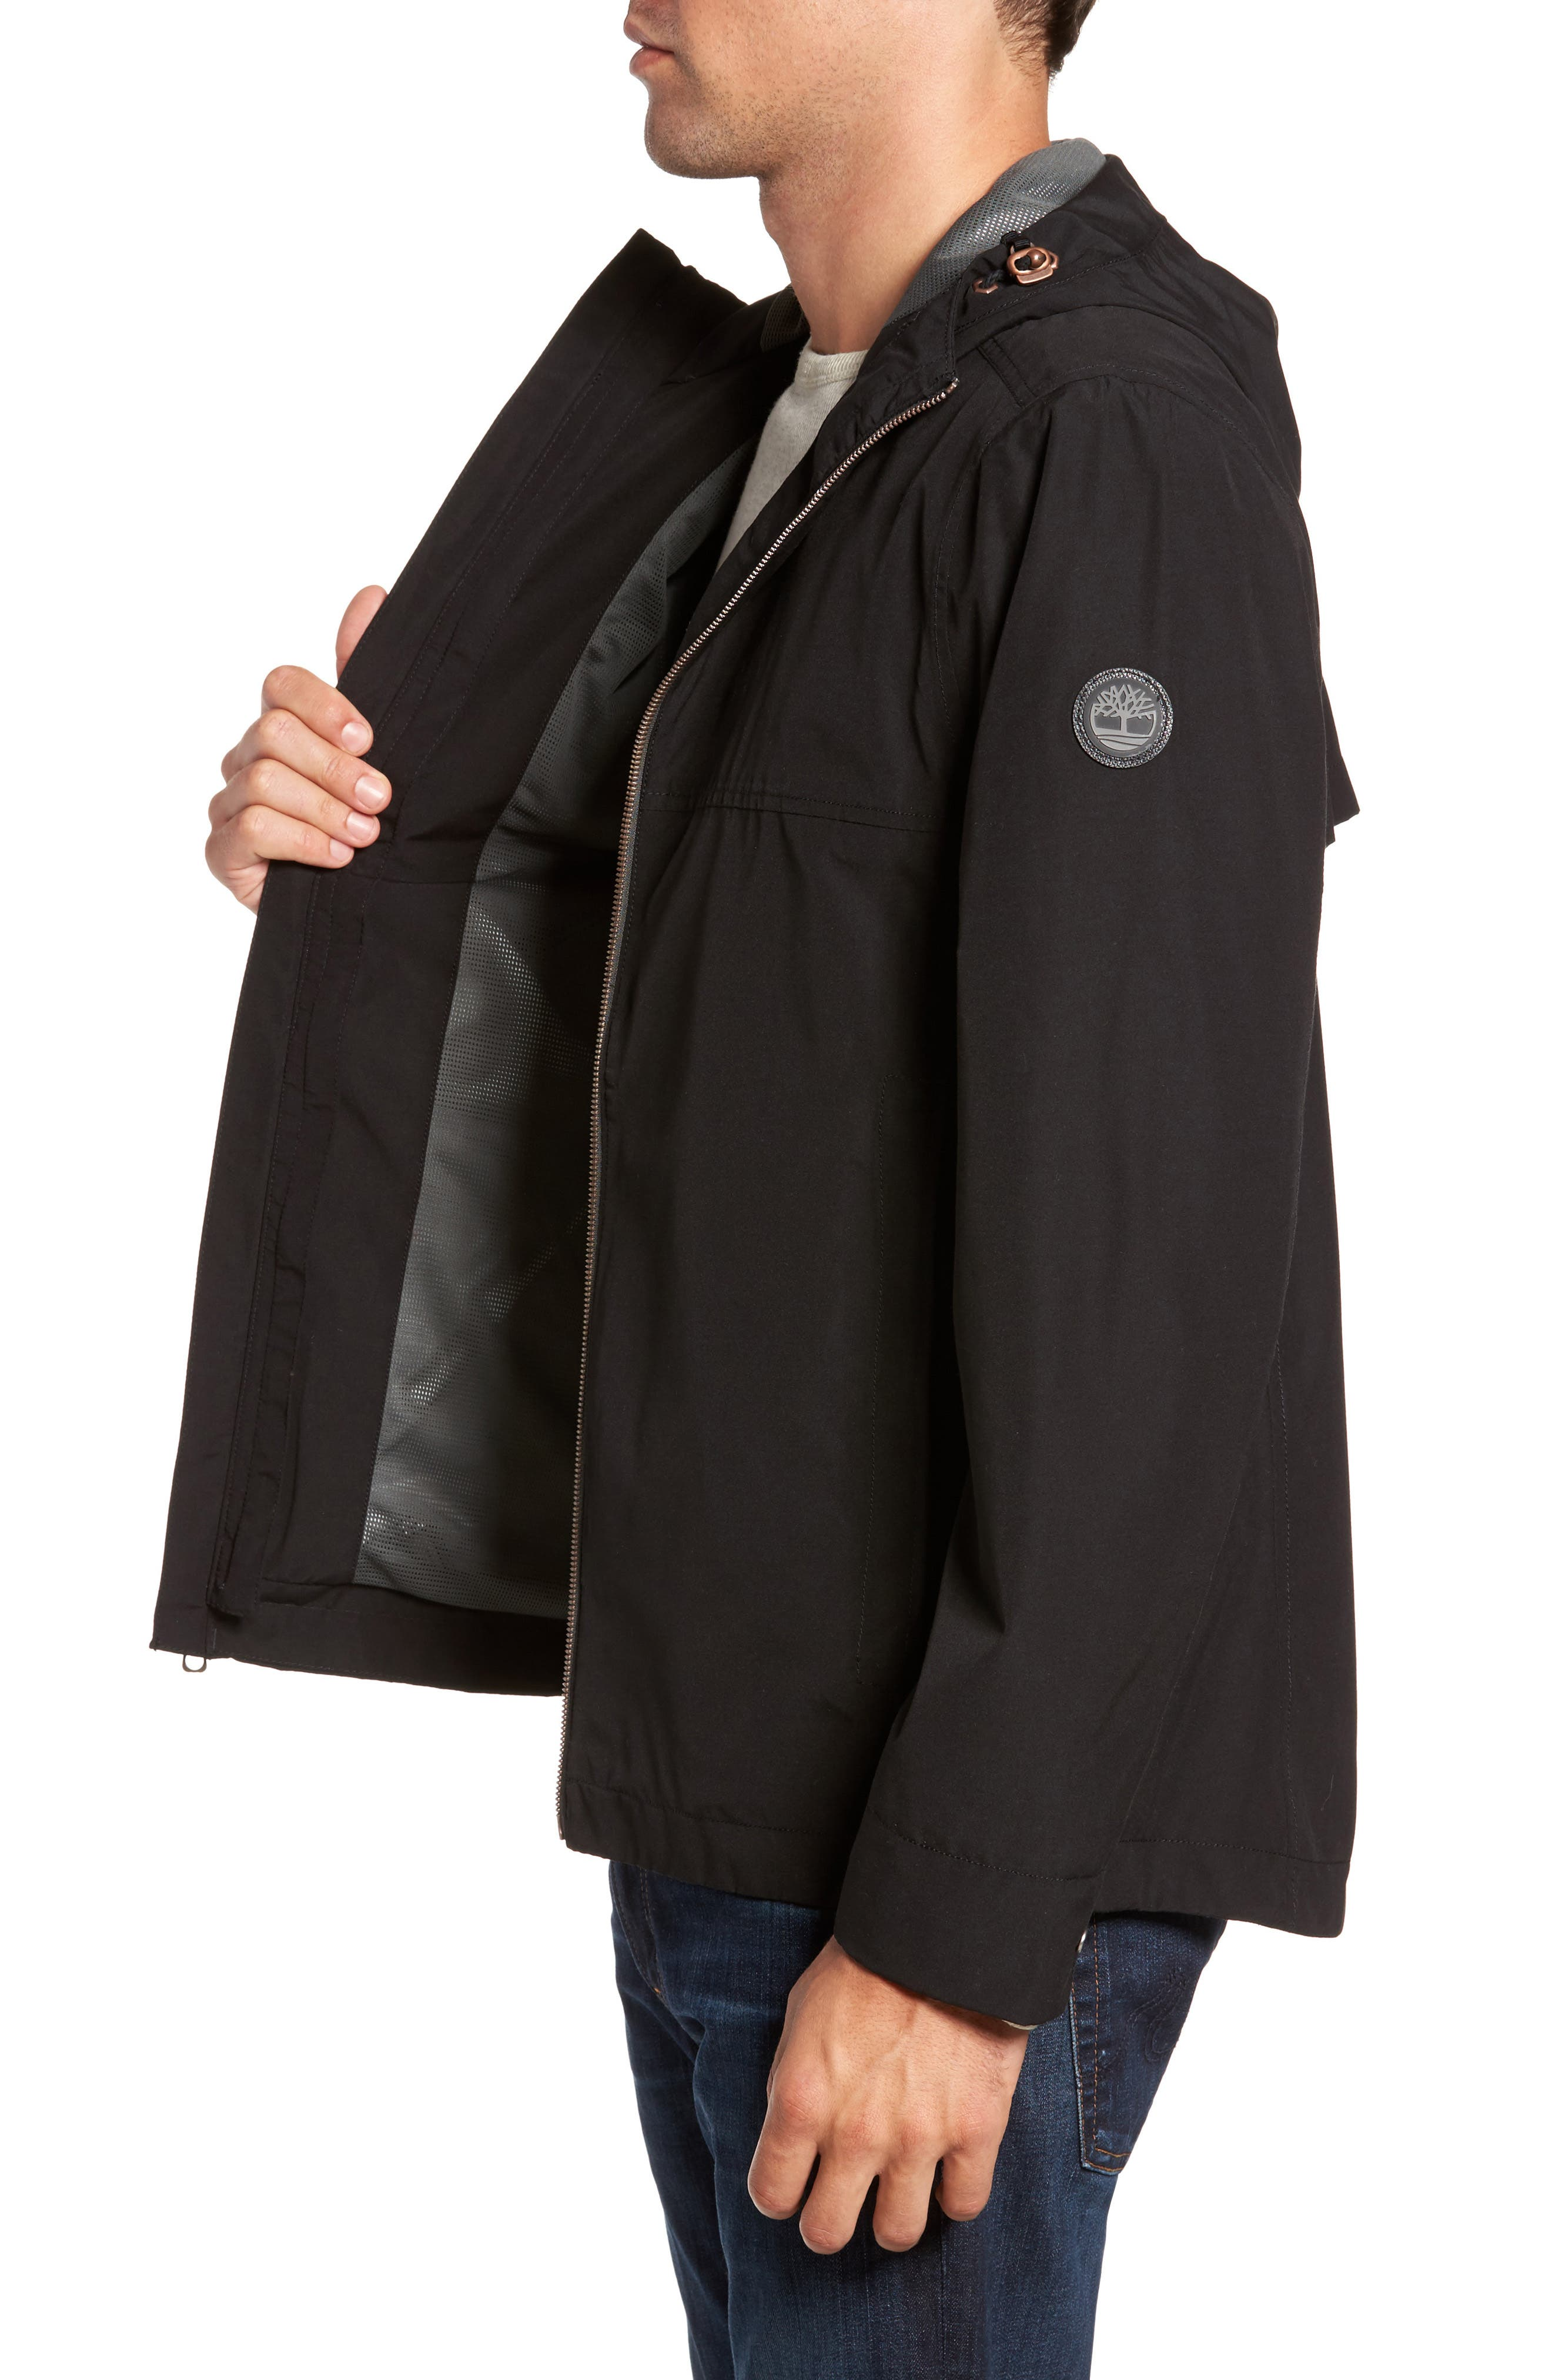 Ragged Mountain Packable Waterproof Jacket,                             Alternate thumbnail 3, color,                             Black